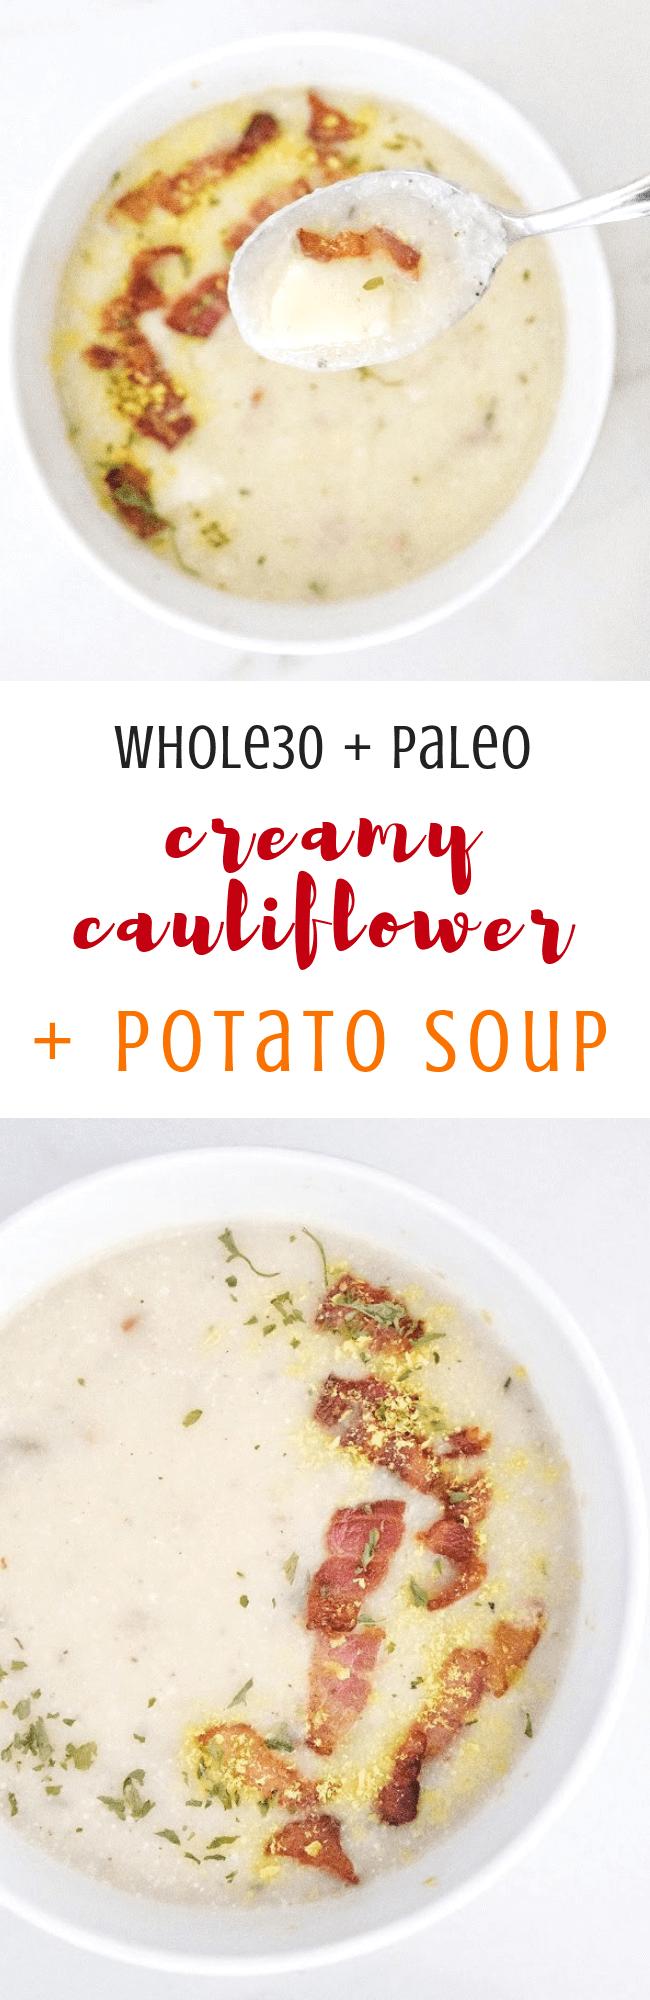 Whole30 Creamy Cauliflower + Potato Soup (Dairy Free, Paleo, Gluten Free) (1).png